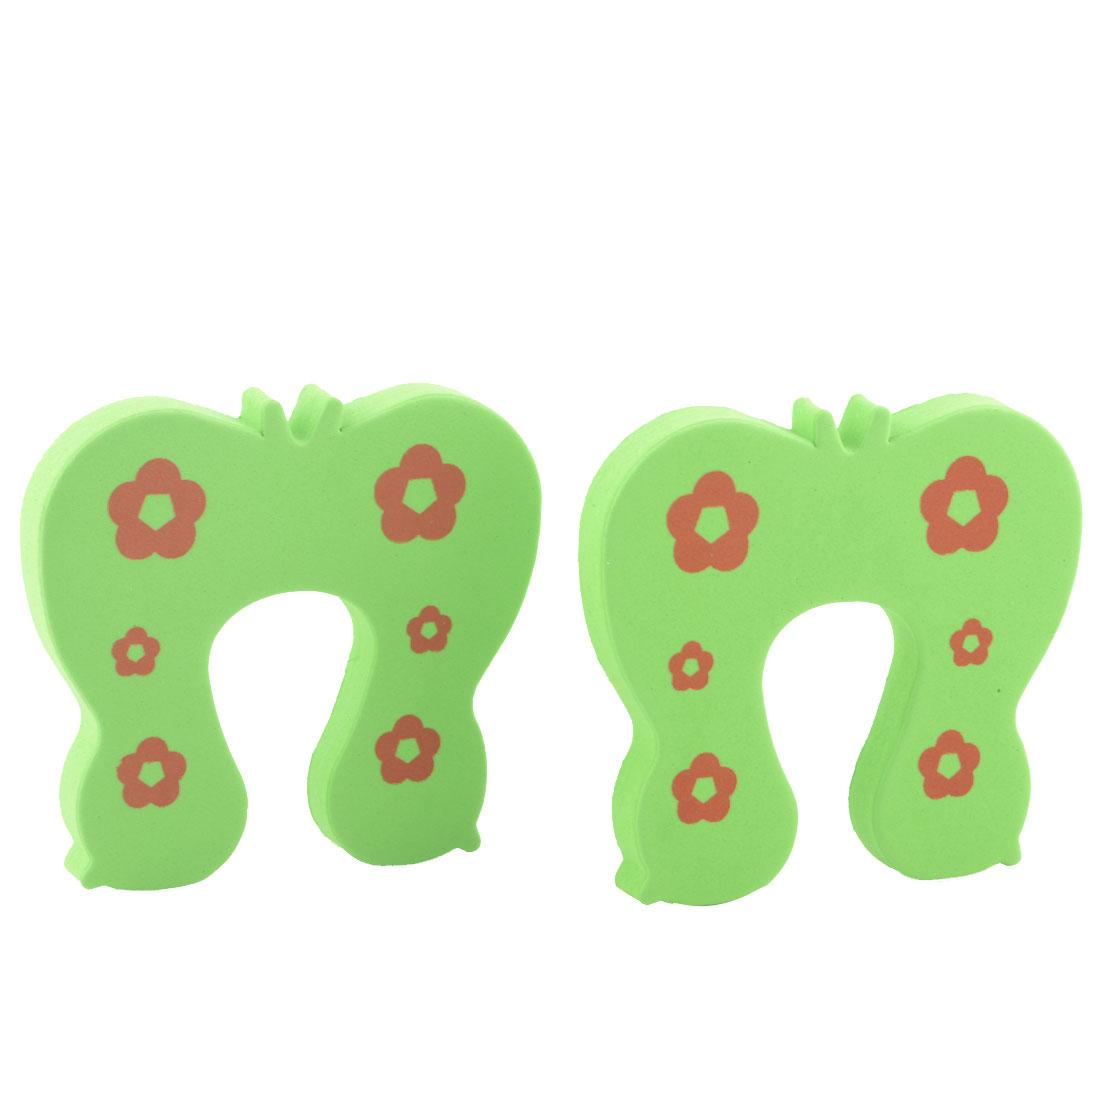 EVA Green Butterfly Finger Protector Safety Guard Doorstop Door Stopper Lock 2pcs